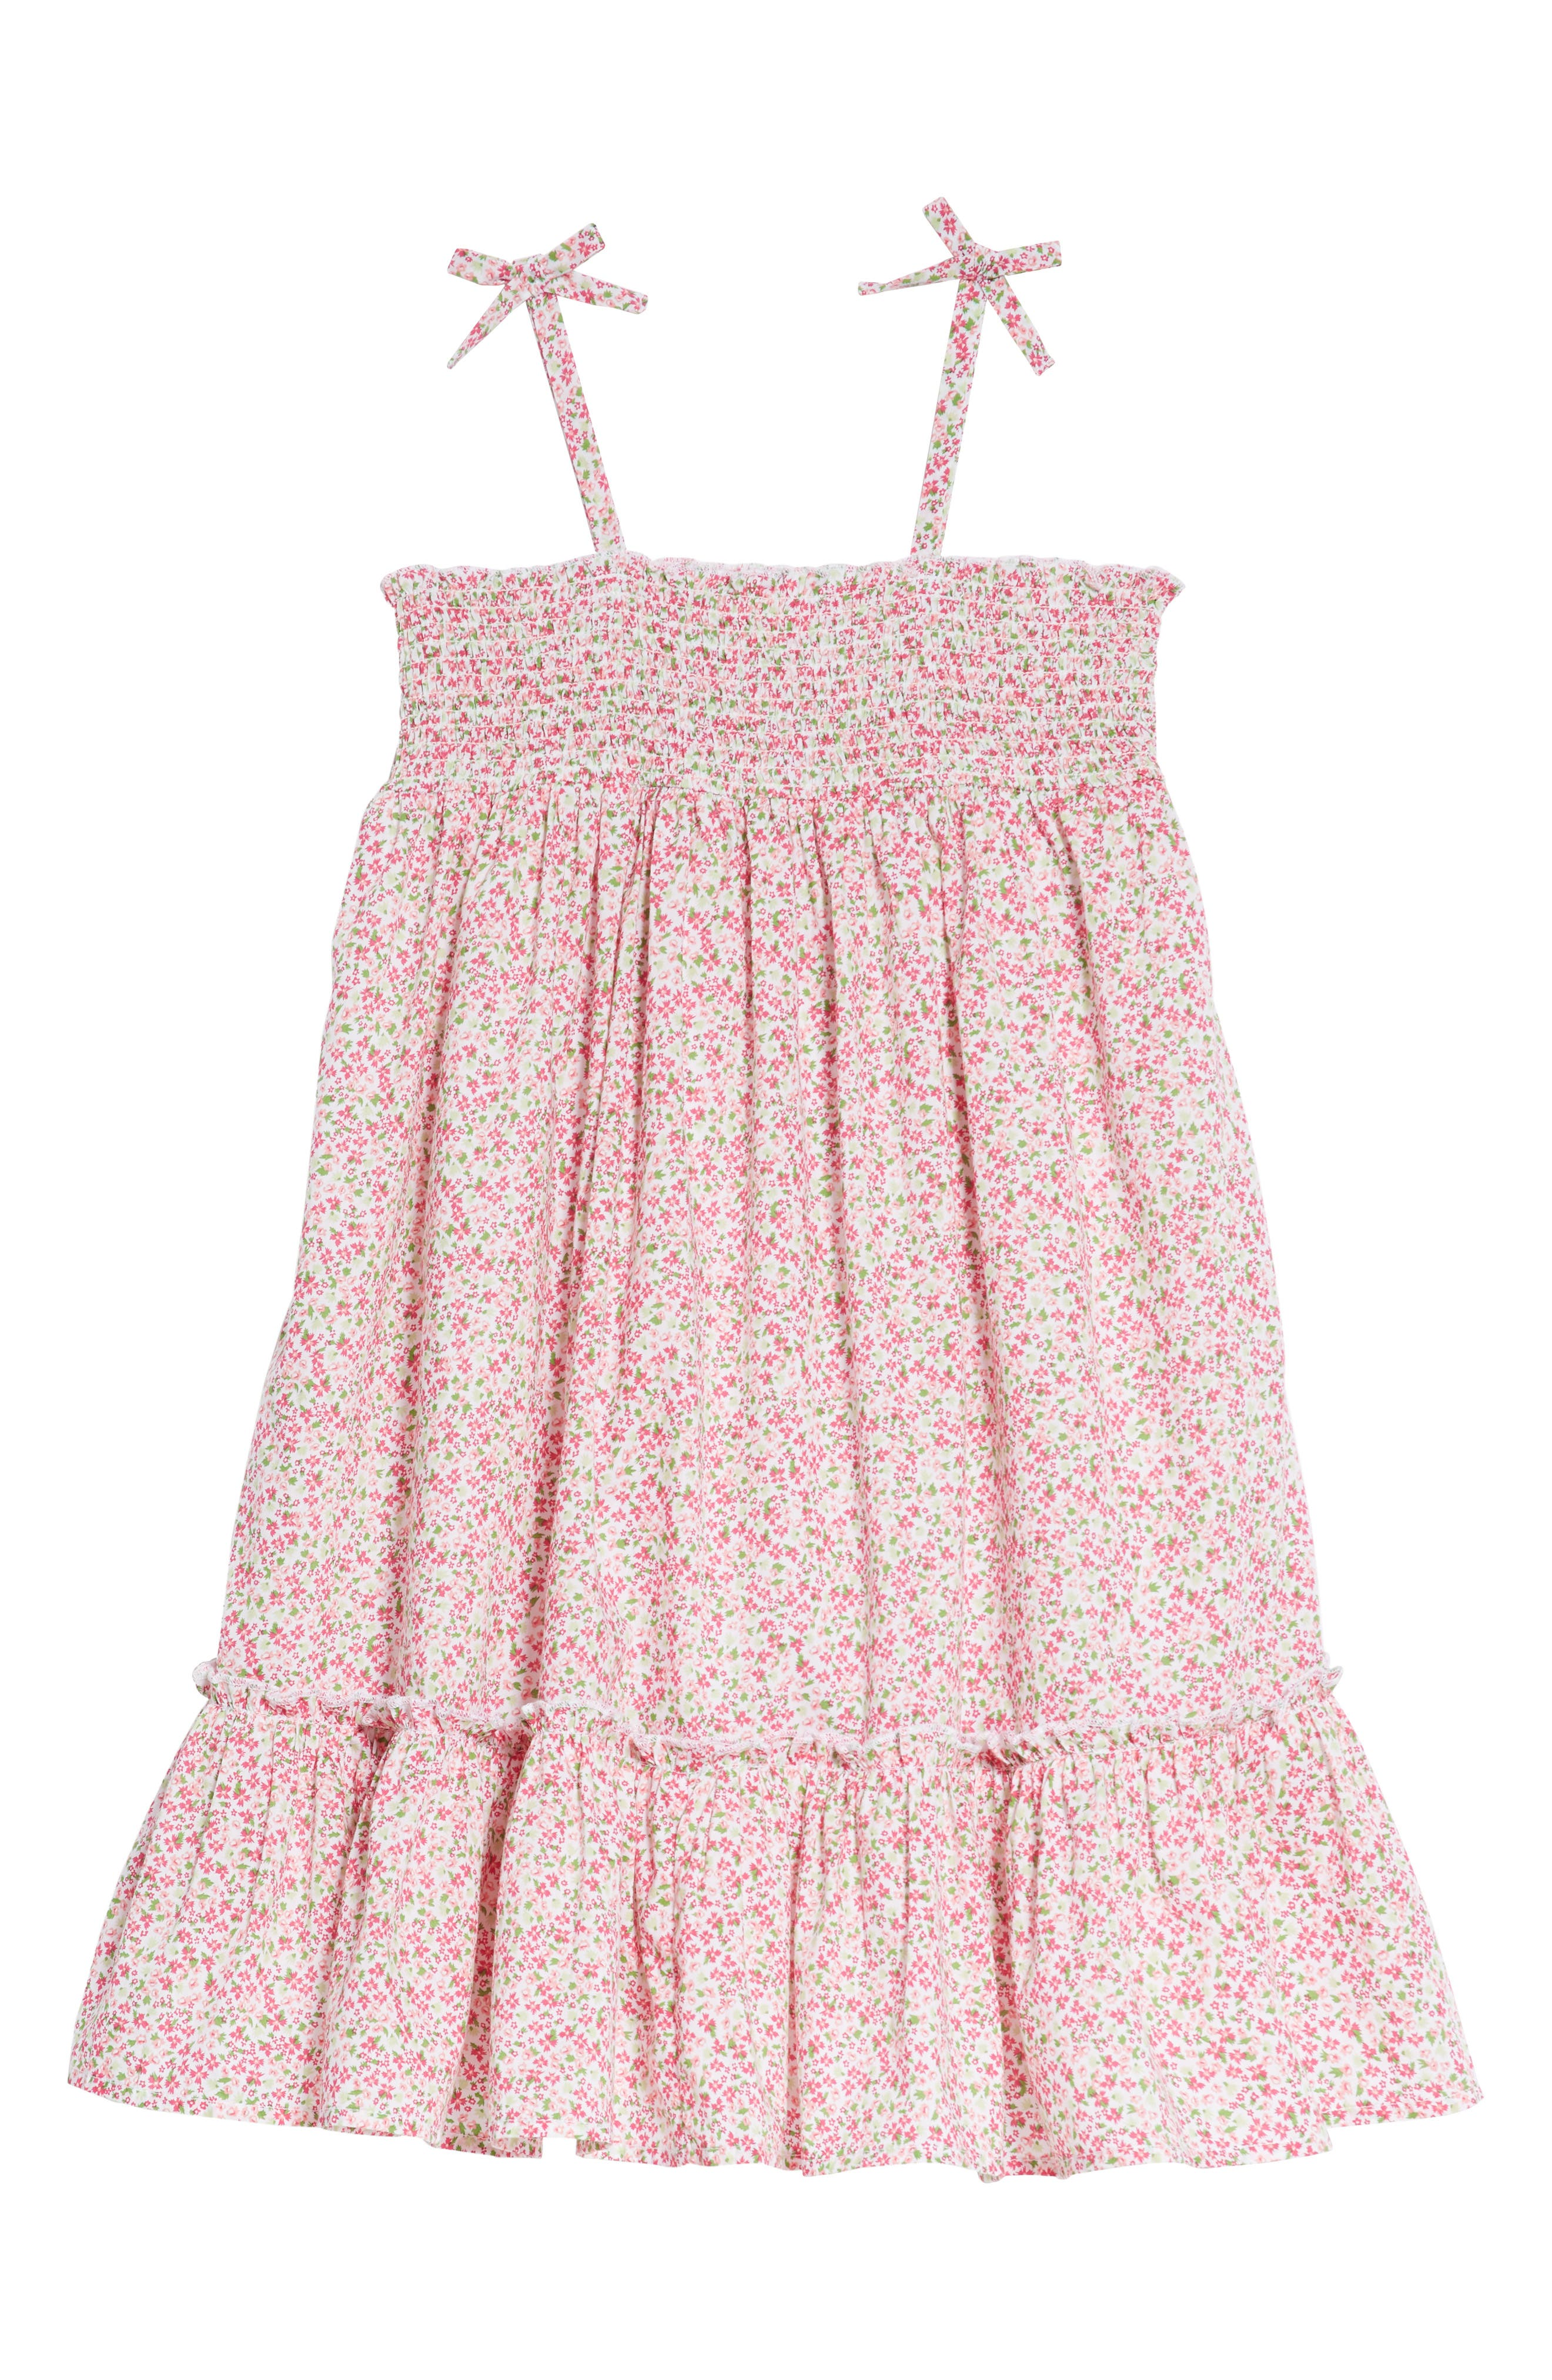 Smocked Ditzy Dress,                         Main,                         color, White- Pink Dense Floral